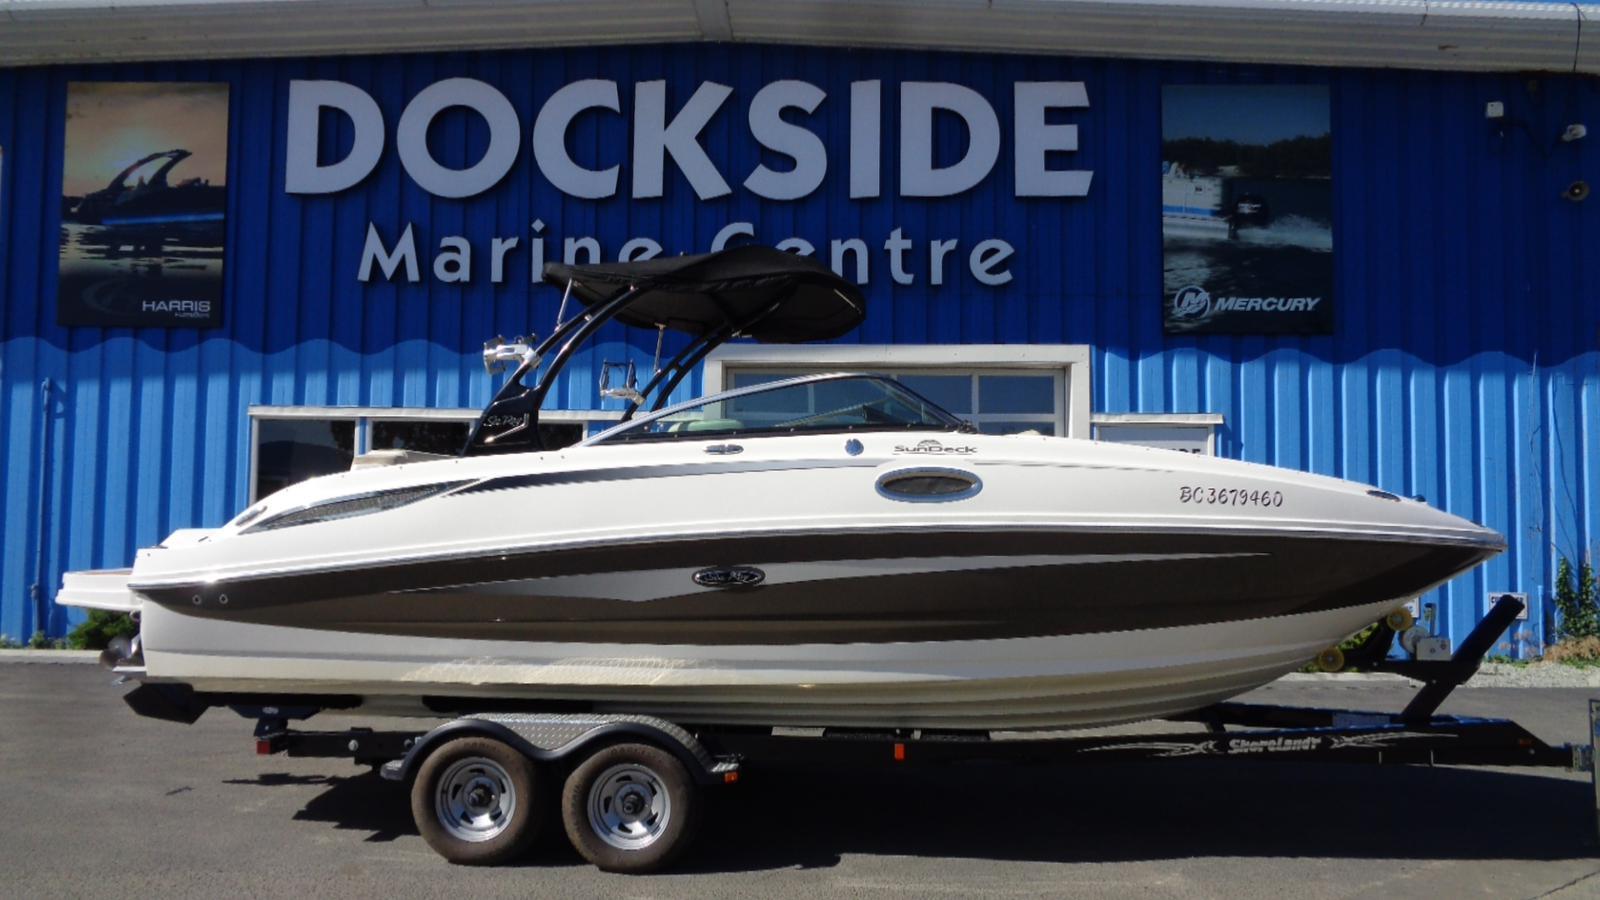 For Sale: 2013 Sea Ray 260 Sundeck 26ft<br/>Dockside Marine Centre, LTD.